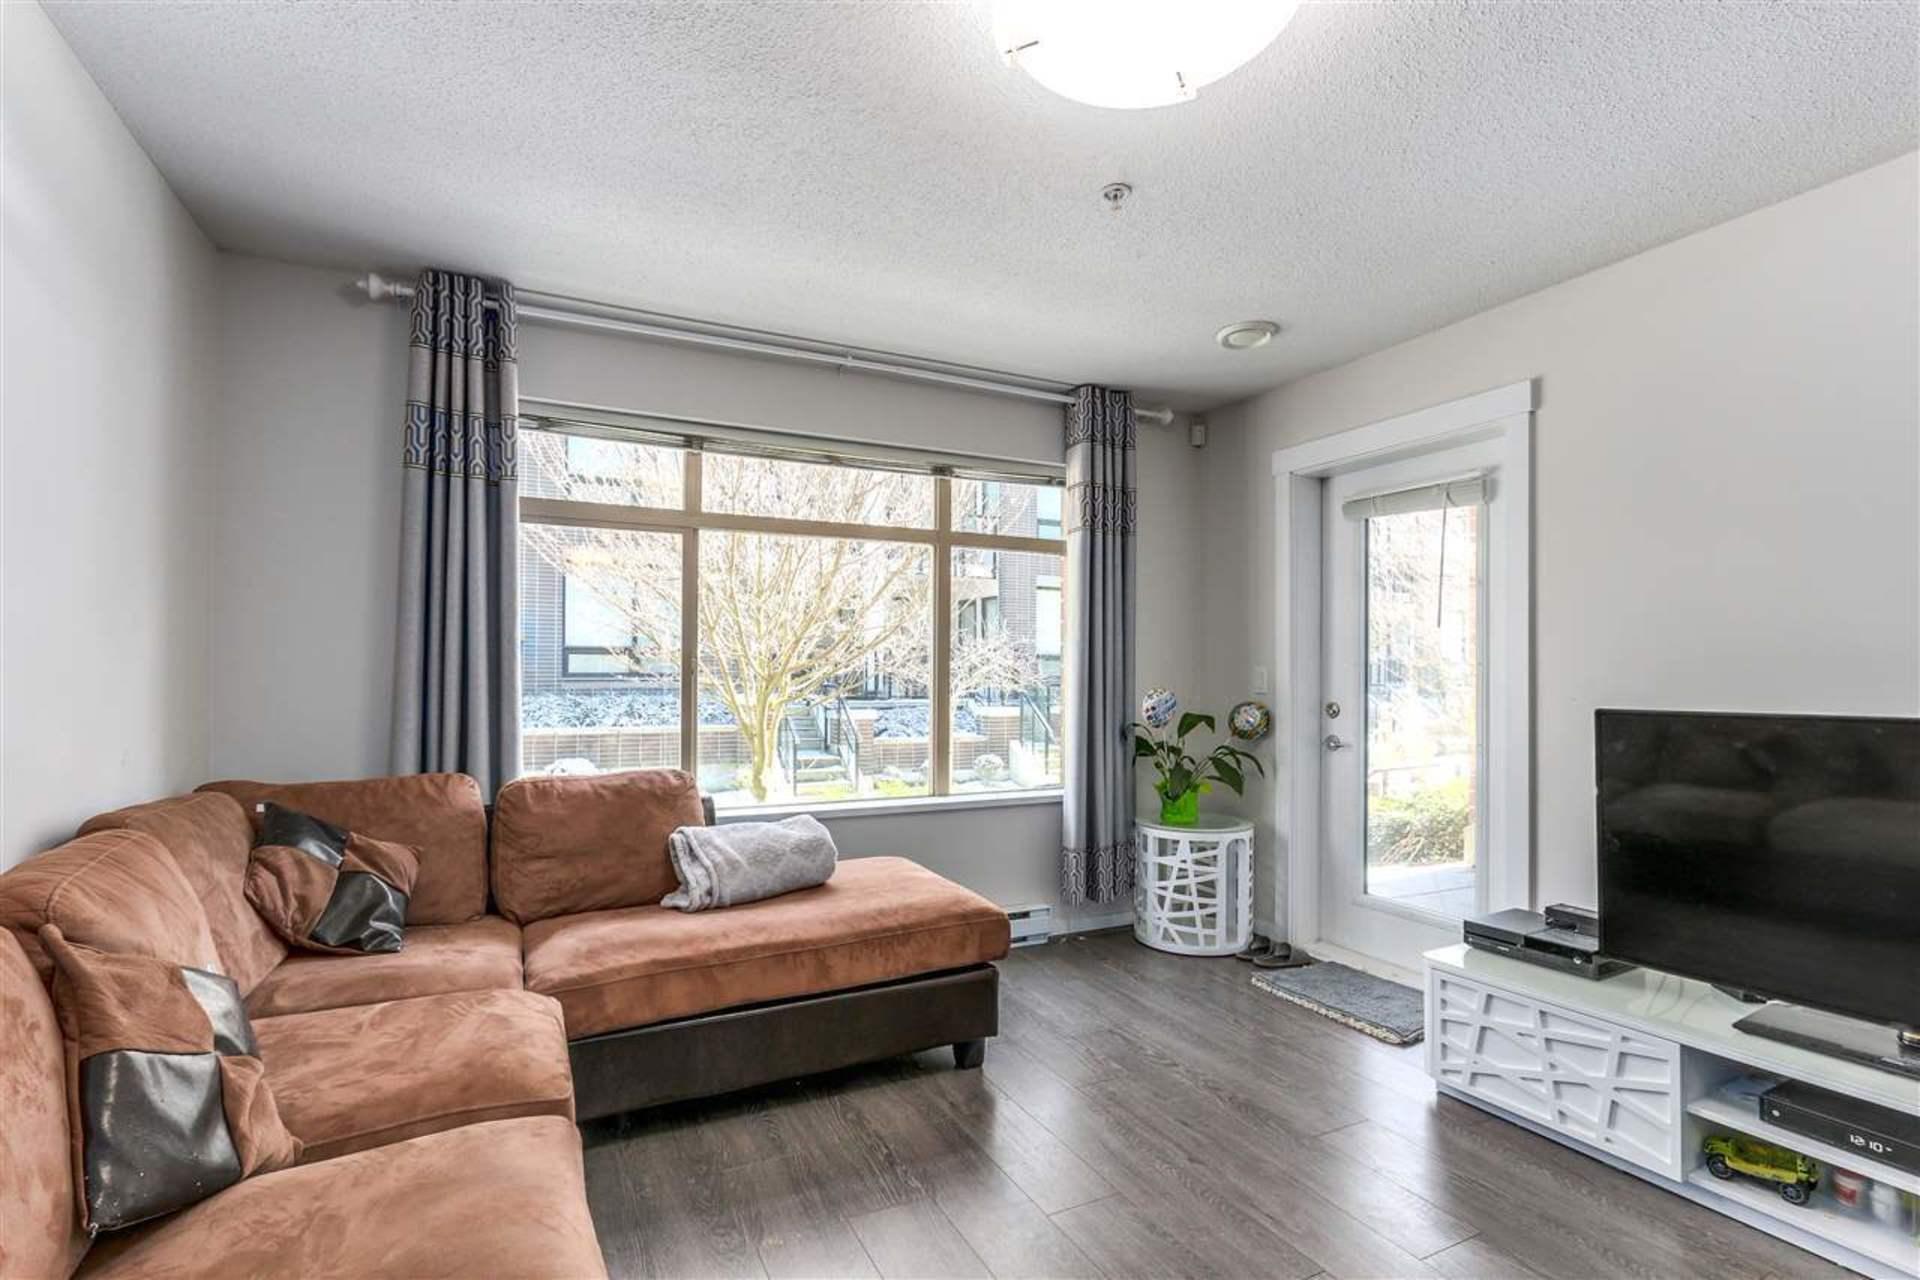 9299-tomicki-avenue-west-cambie-richmond-09